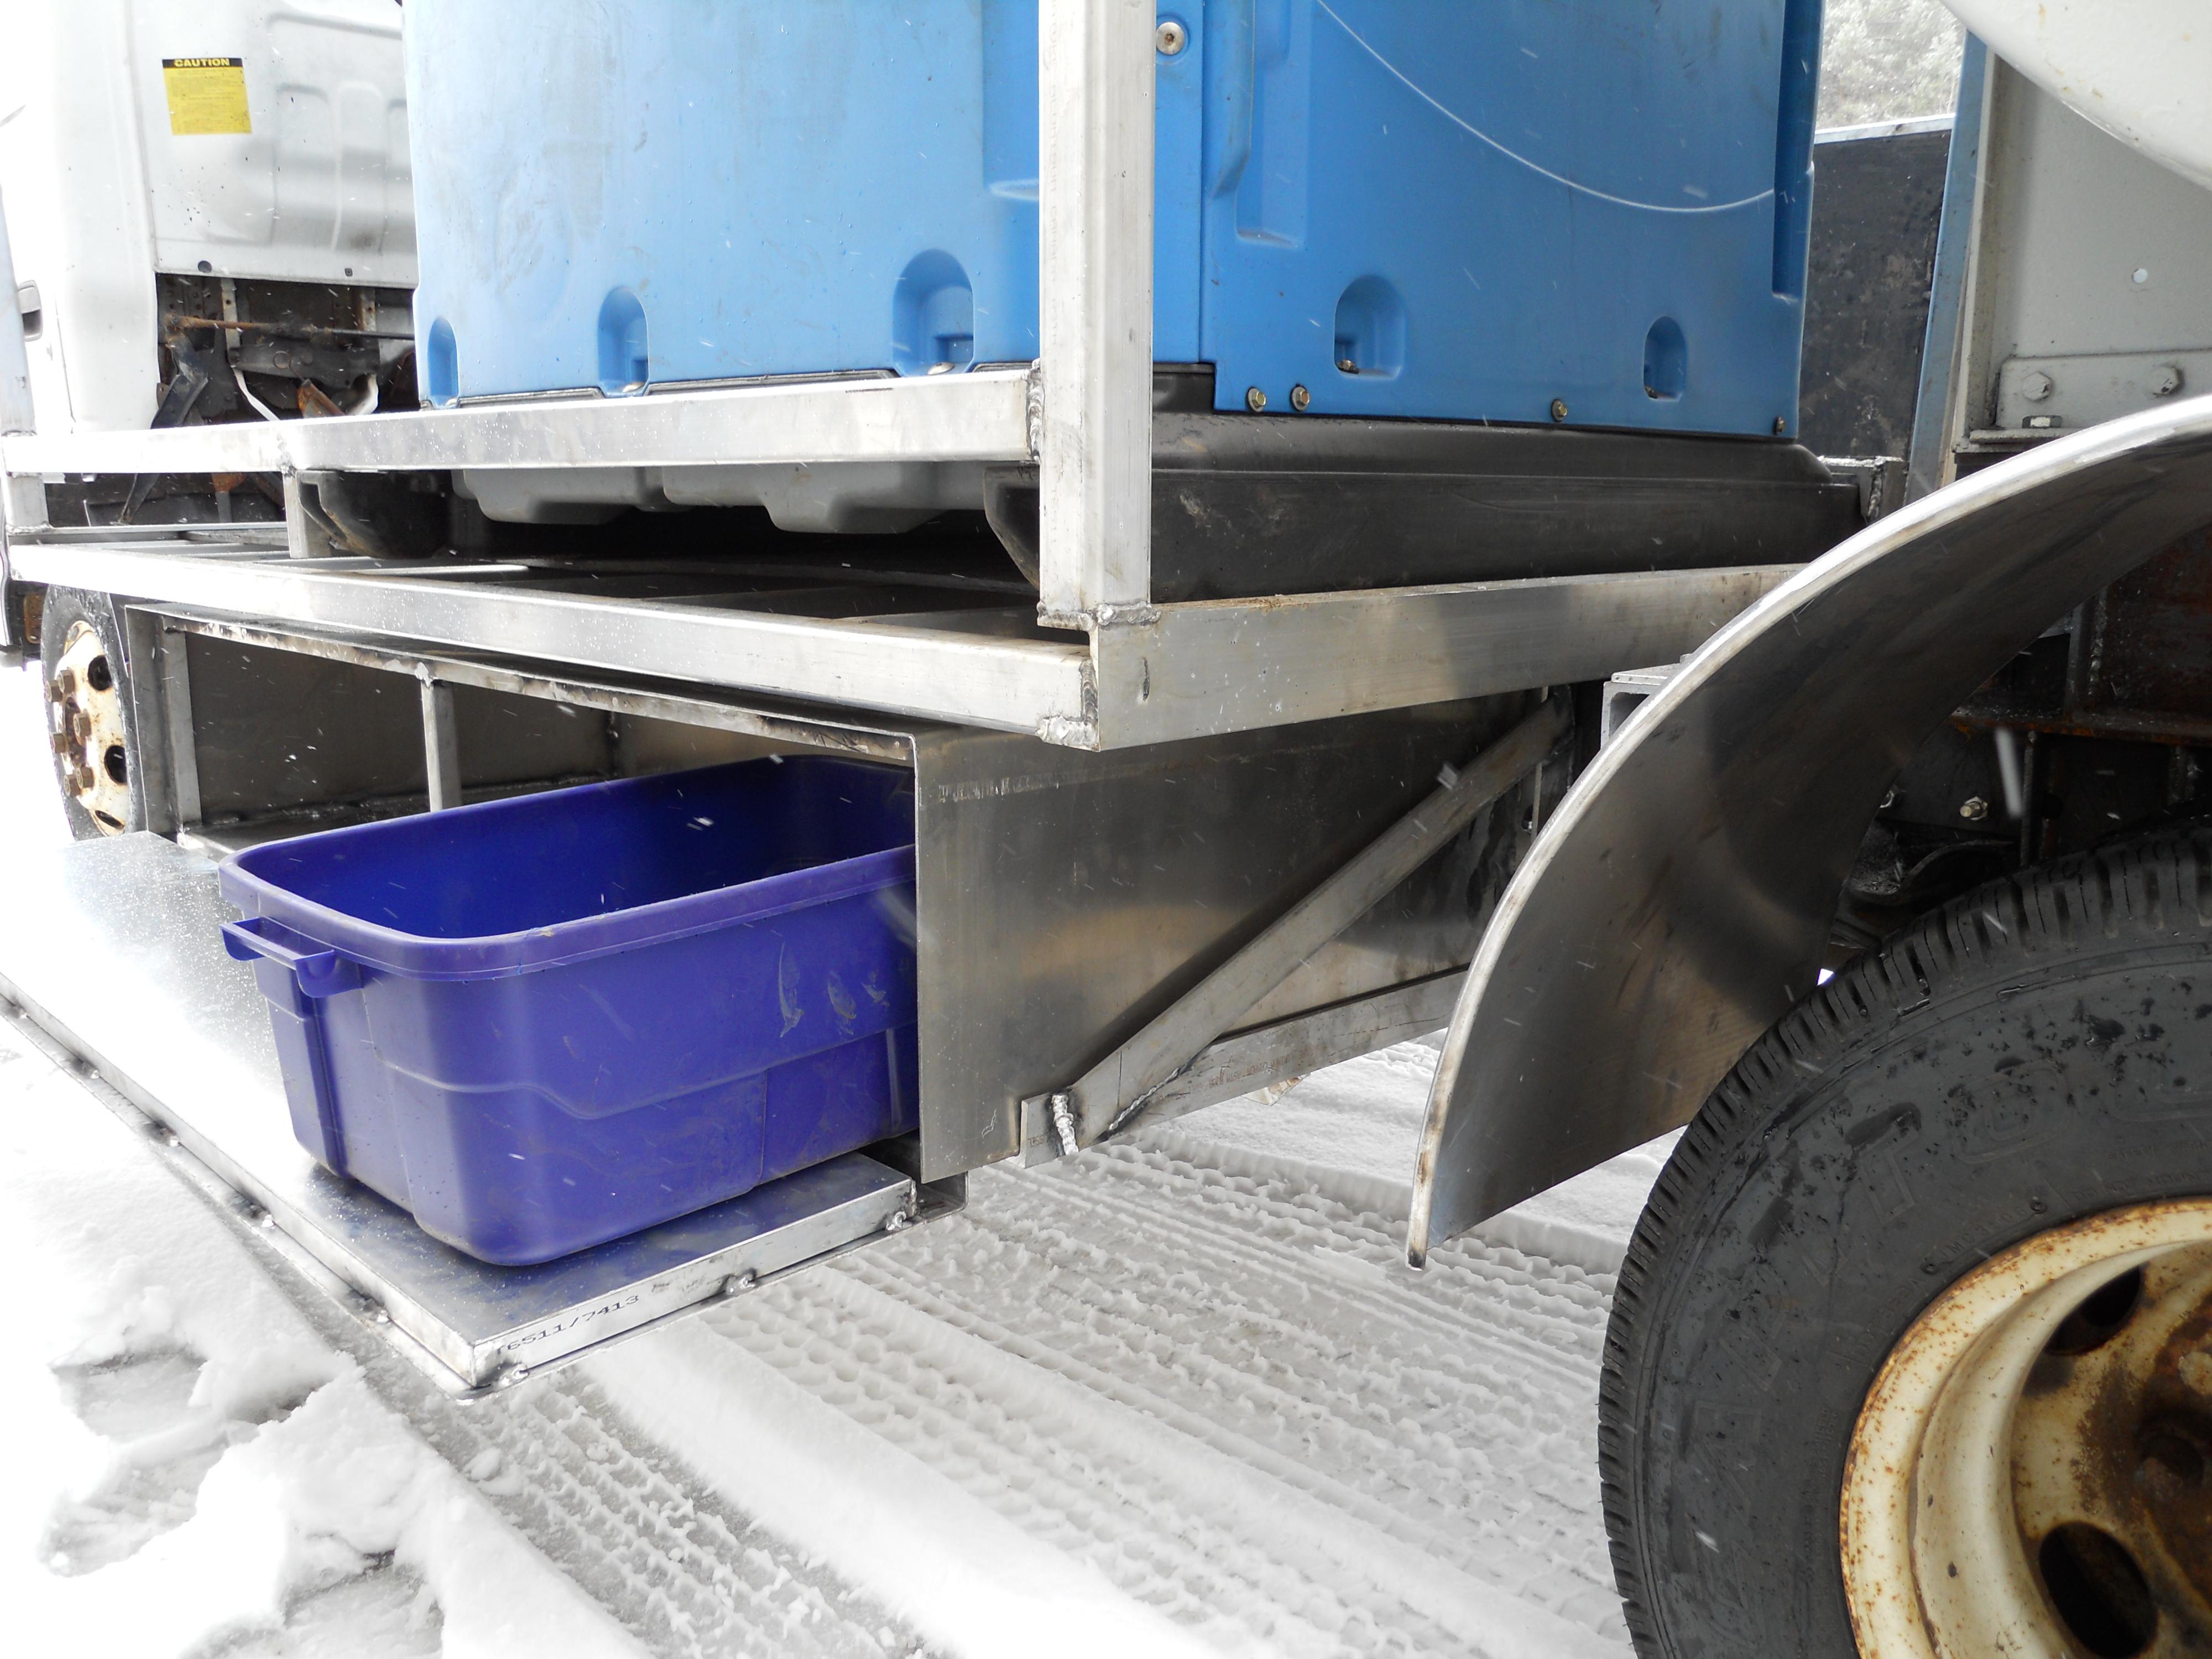 Portable Toilet Service Truck Under Bed Storage Bin Hebel Welding Machine